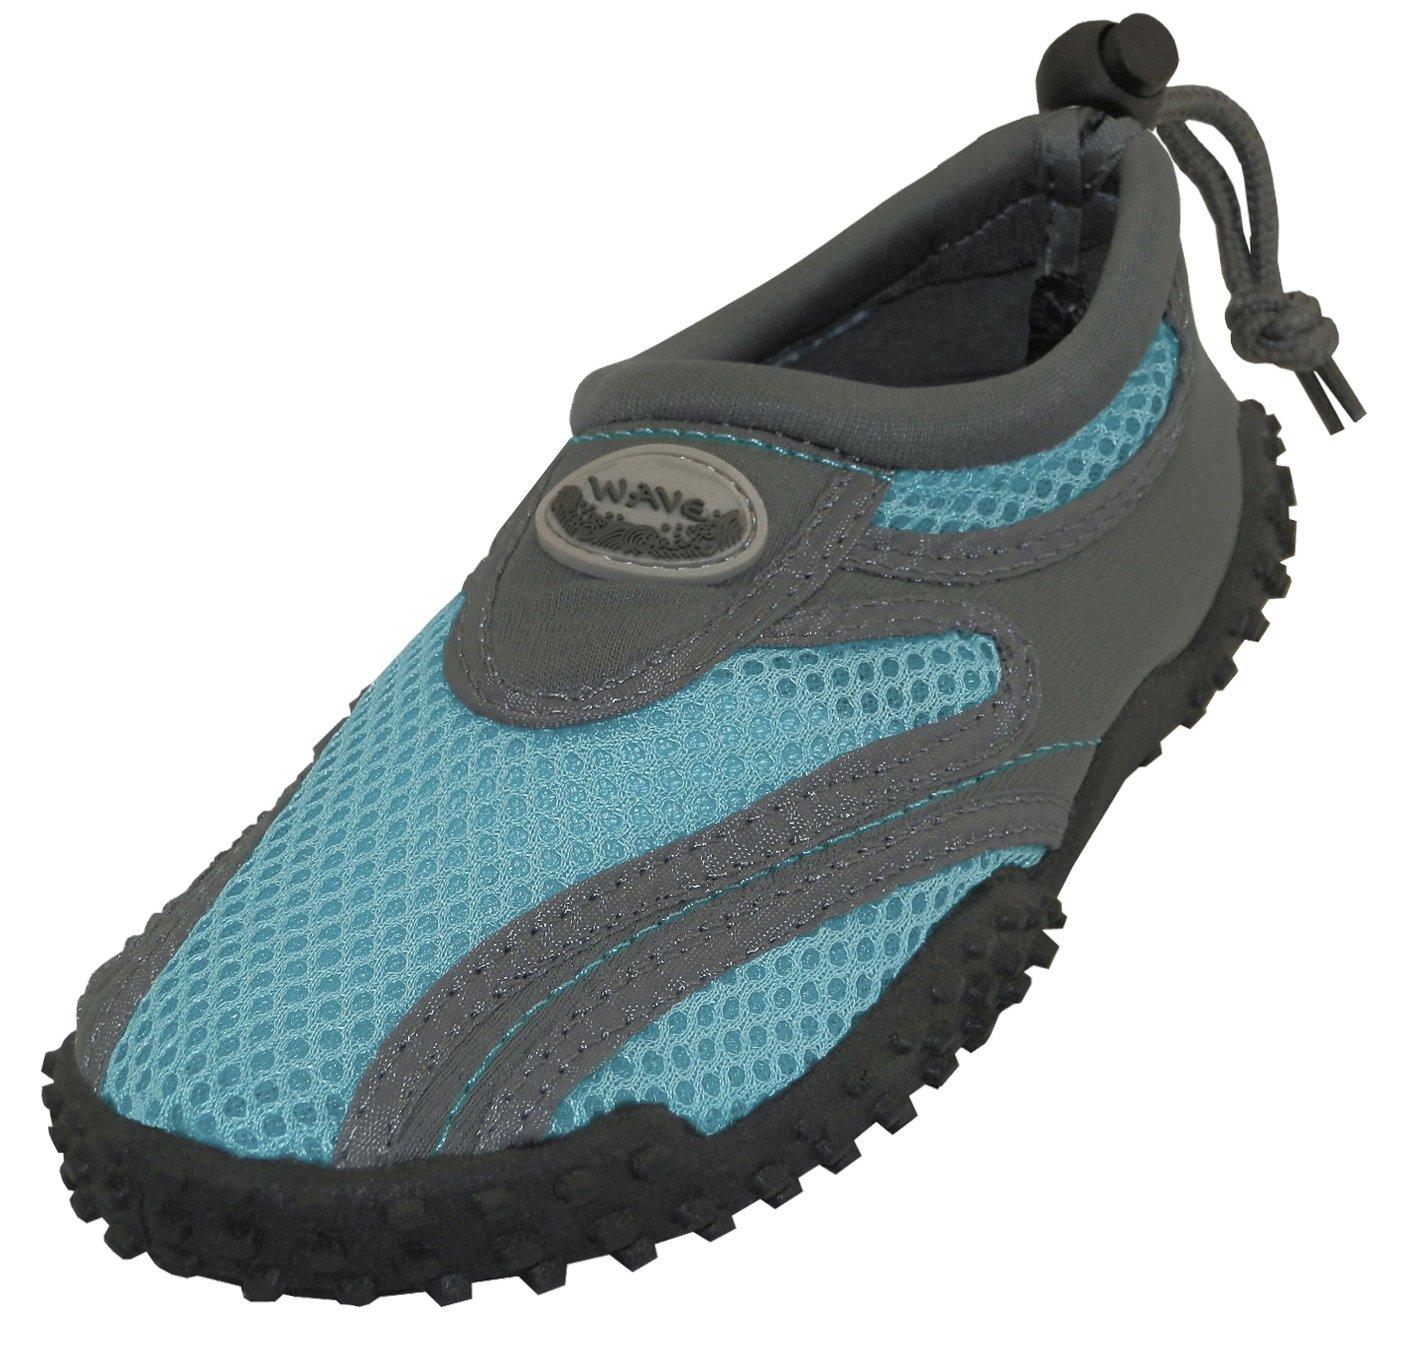 Cambridge Select Women's Closed Toe Non-Slip Drawstring Mesh Quick Dry Slip-On Water Shoe B07B5CRZ8T 7 B(M) US|Grey/Light Blue